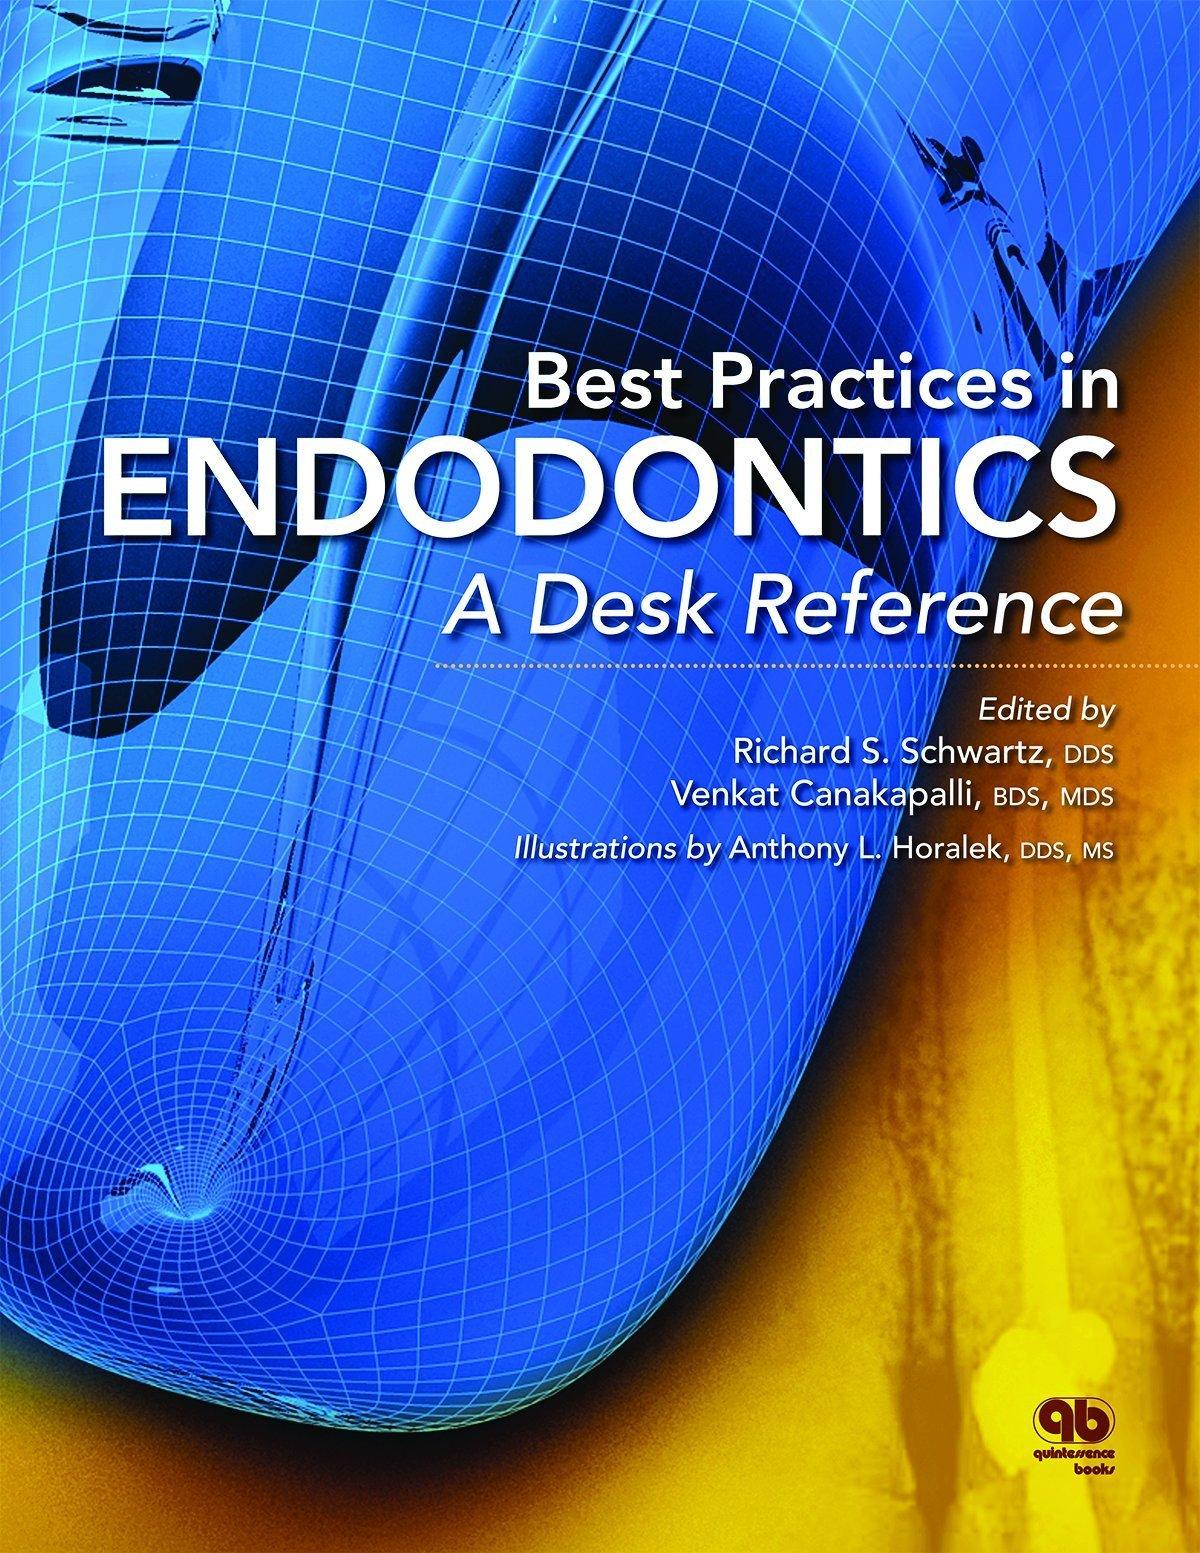 Best Practices in Endodontics: A Desk Reference by Richard S. Schwartz  (Editor), Venkat Canakapalli (Editor), Anthony L. Horalek (Illustrator)  (15-May-2015) ...